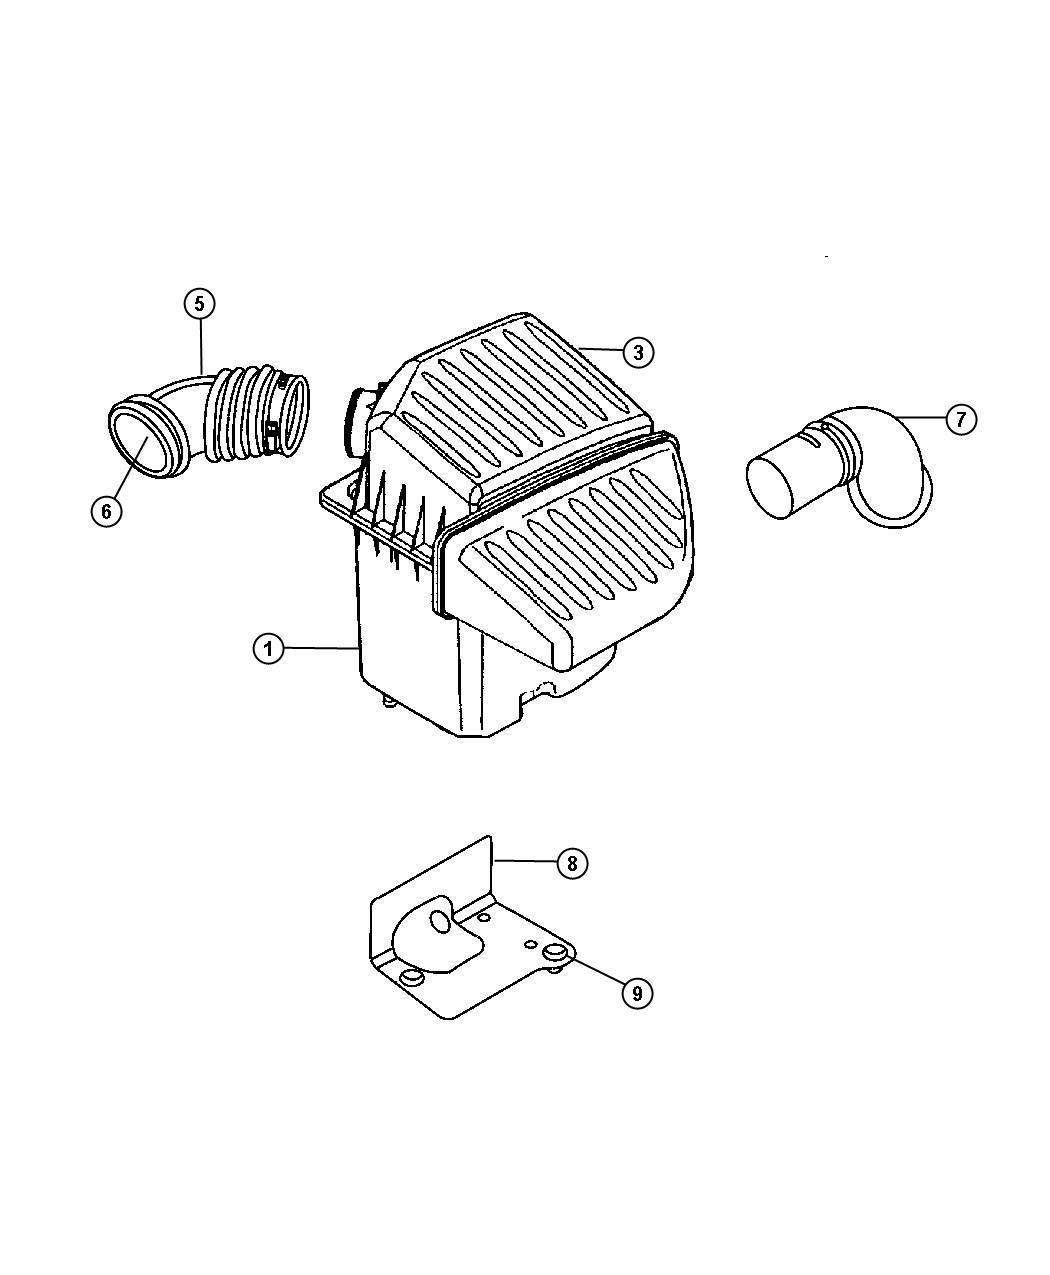 Chrysler Pt Cruiser Filter Crankcase Vent Located In